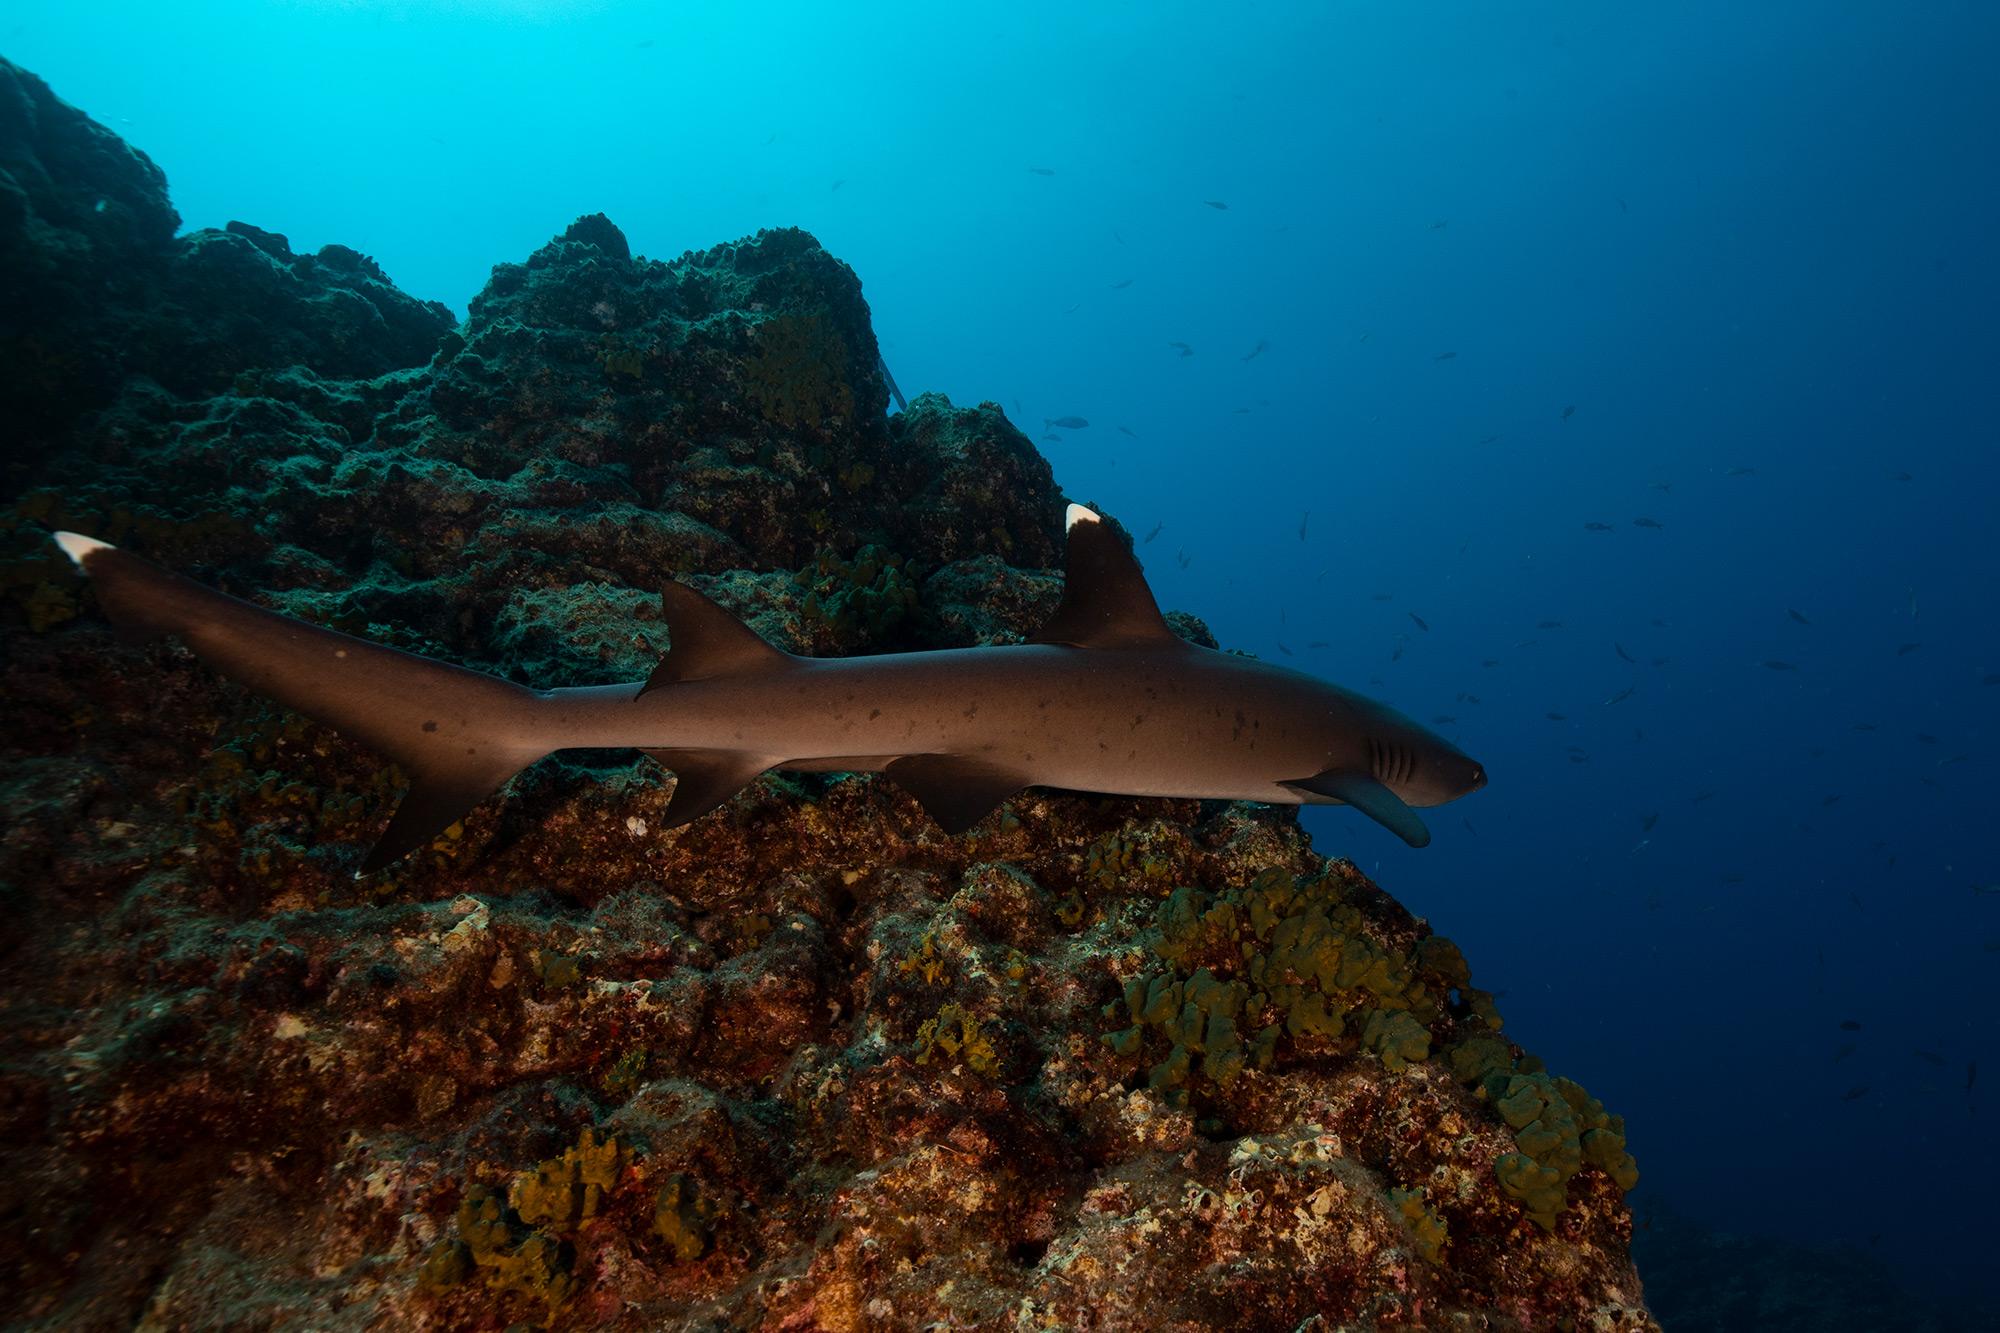 Shark Week 2021 MYSTERY OF THE BLACK DEMON SHARK